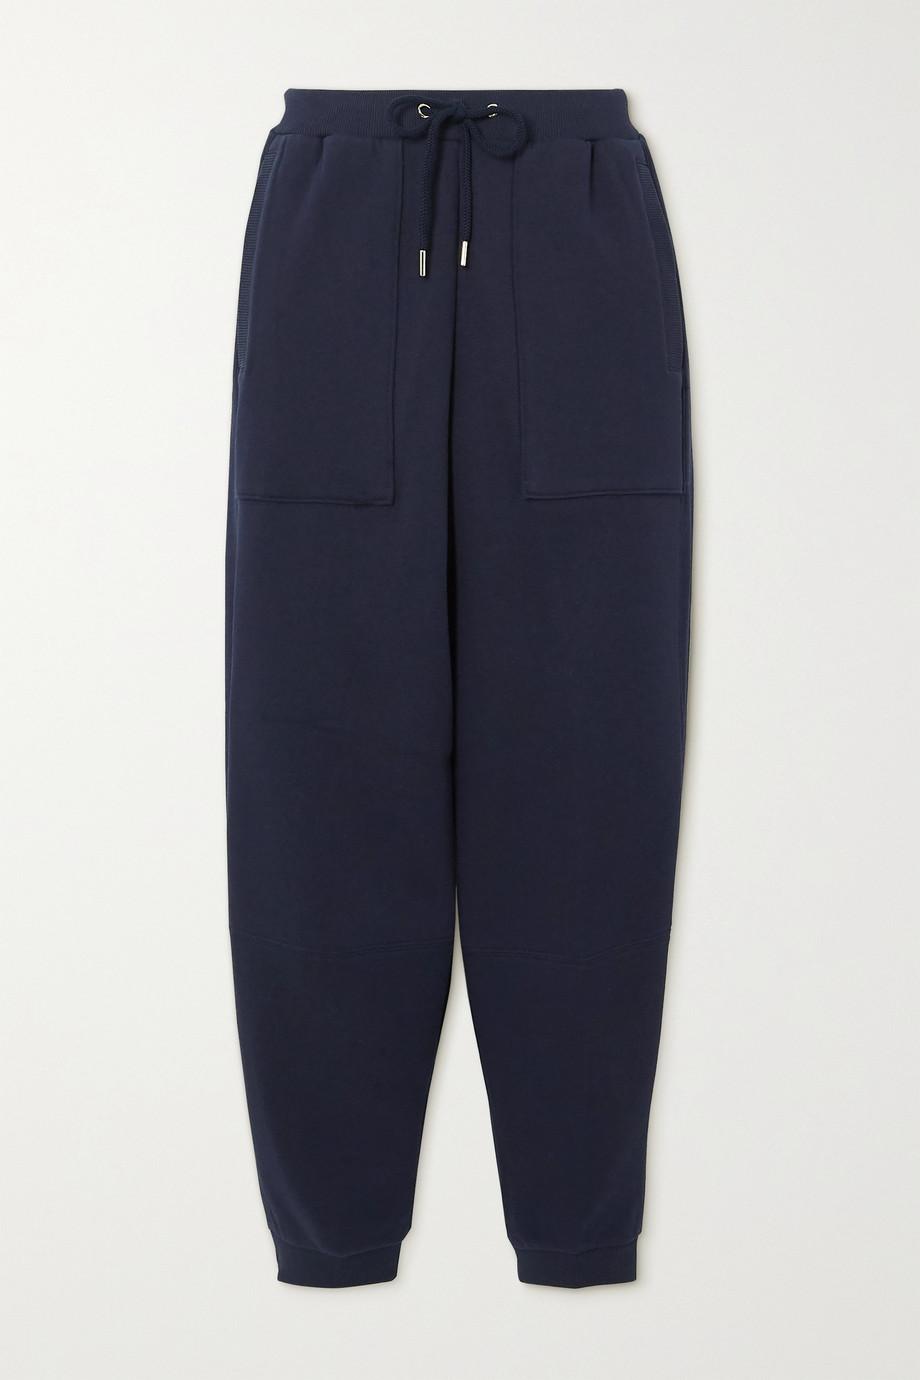 Stella McCartney + NET SUSTAIN cropped organic cotton-jersey track pants